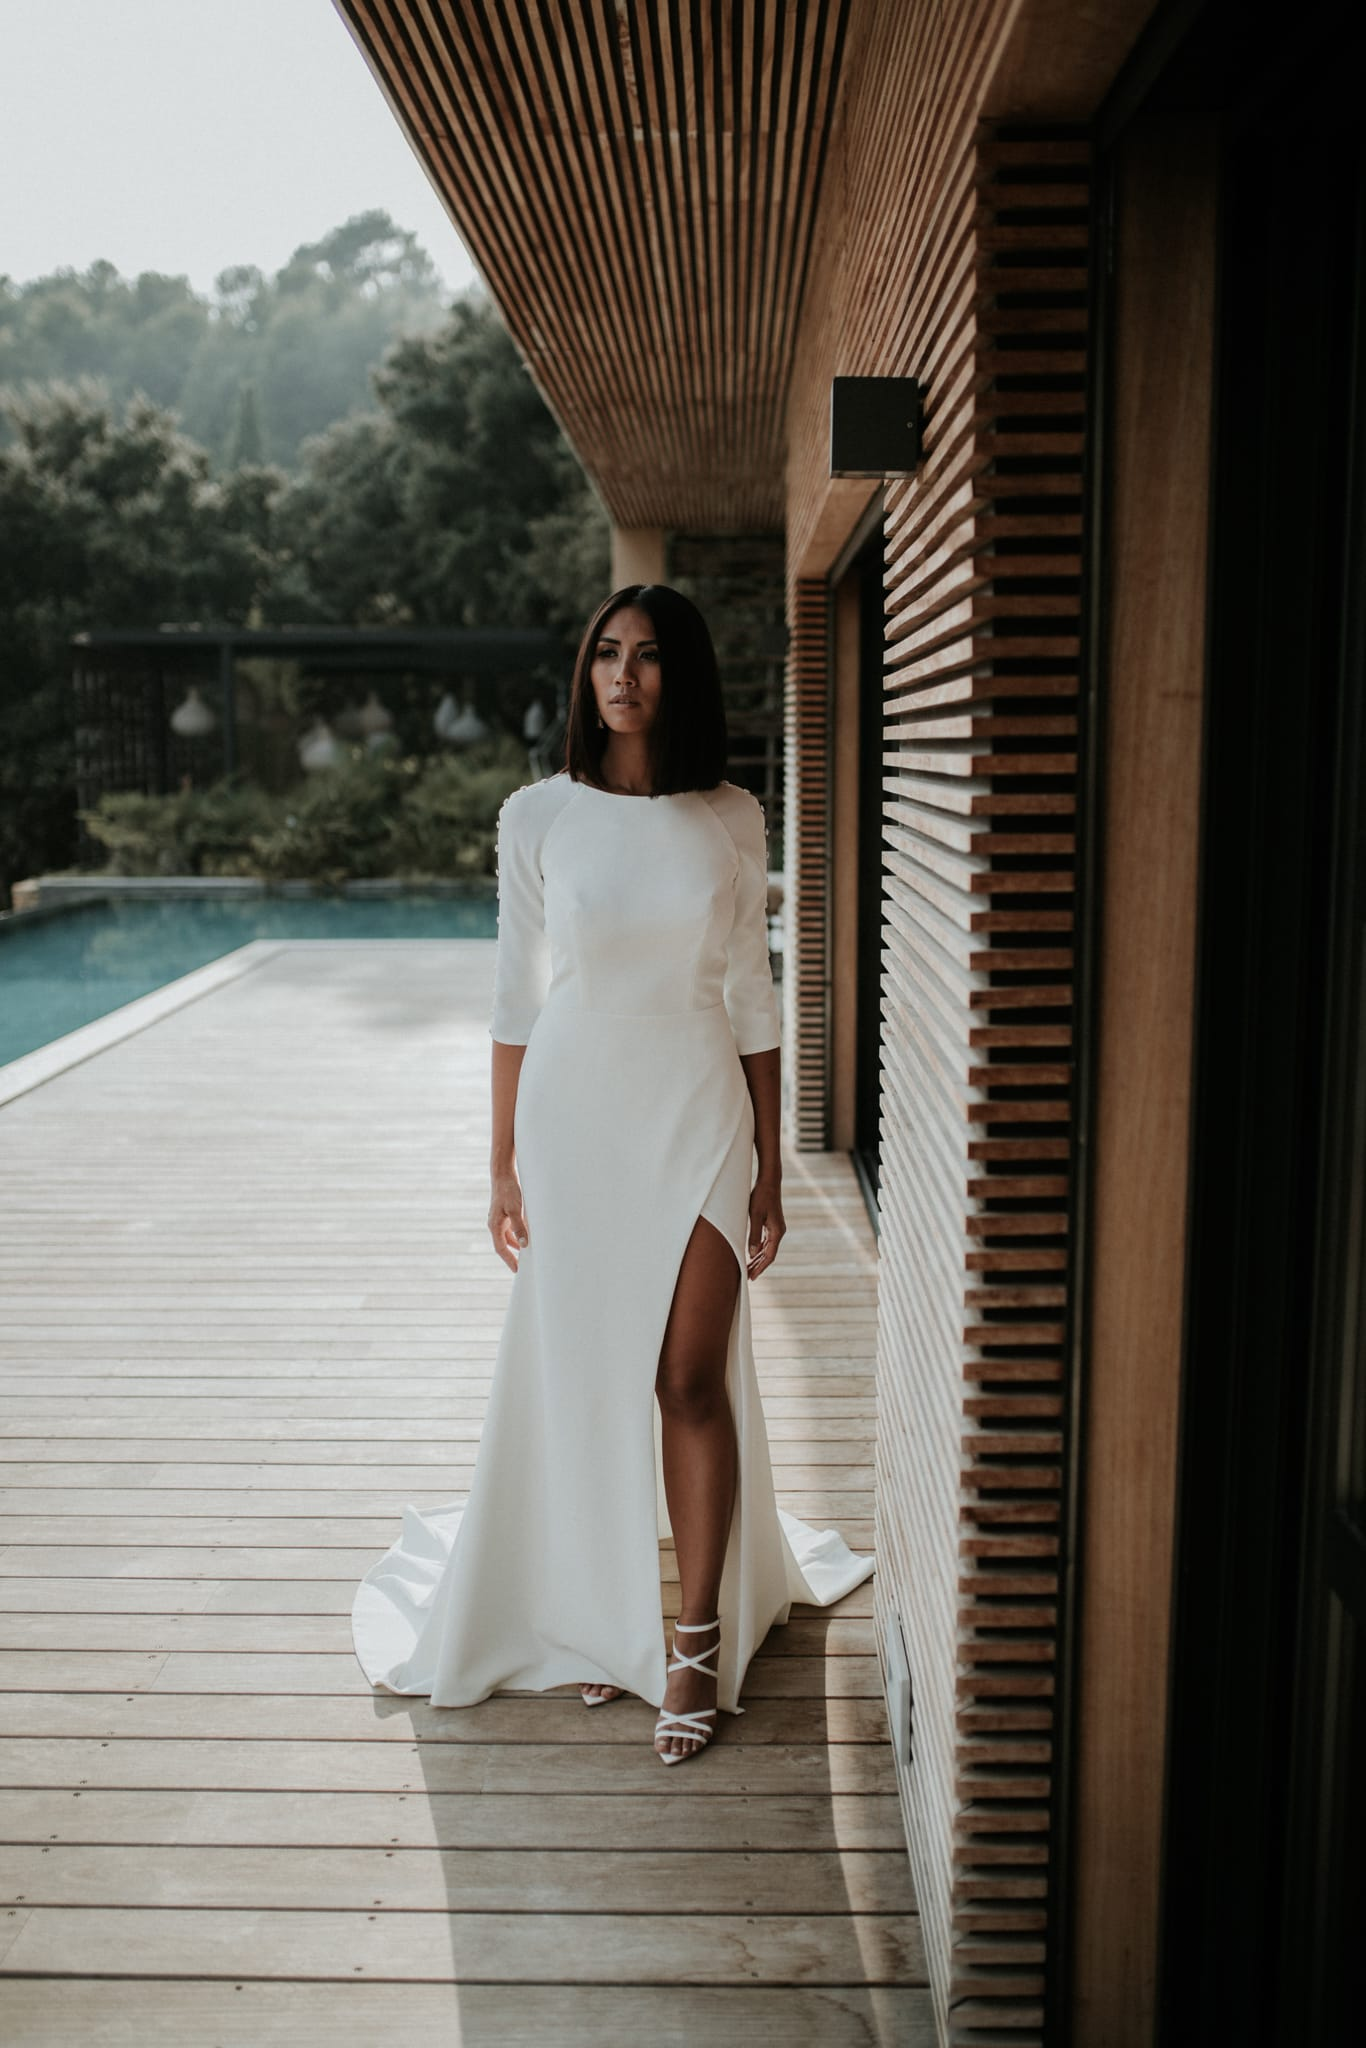 Manon Gontero - Robes de mariée - Collection 2020 - Photos : Soulpics